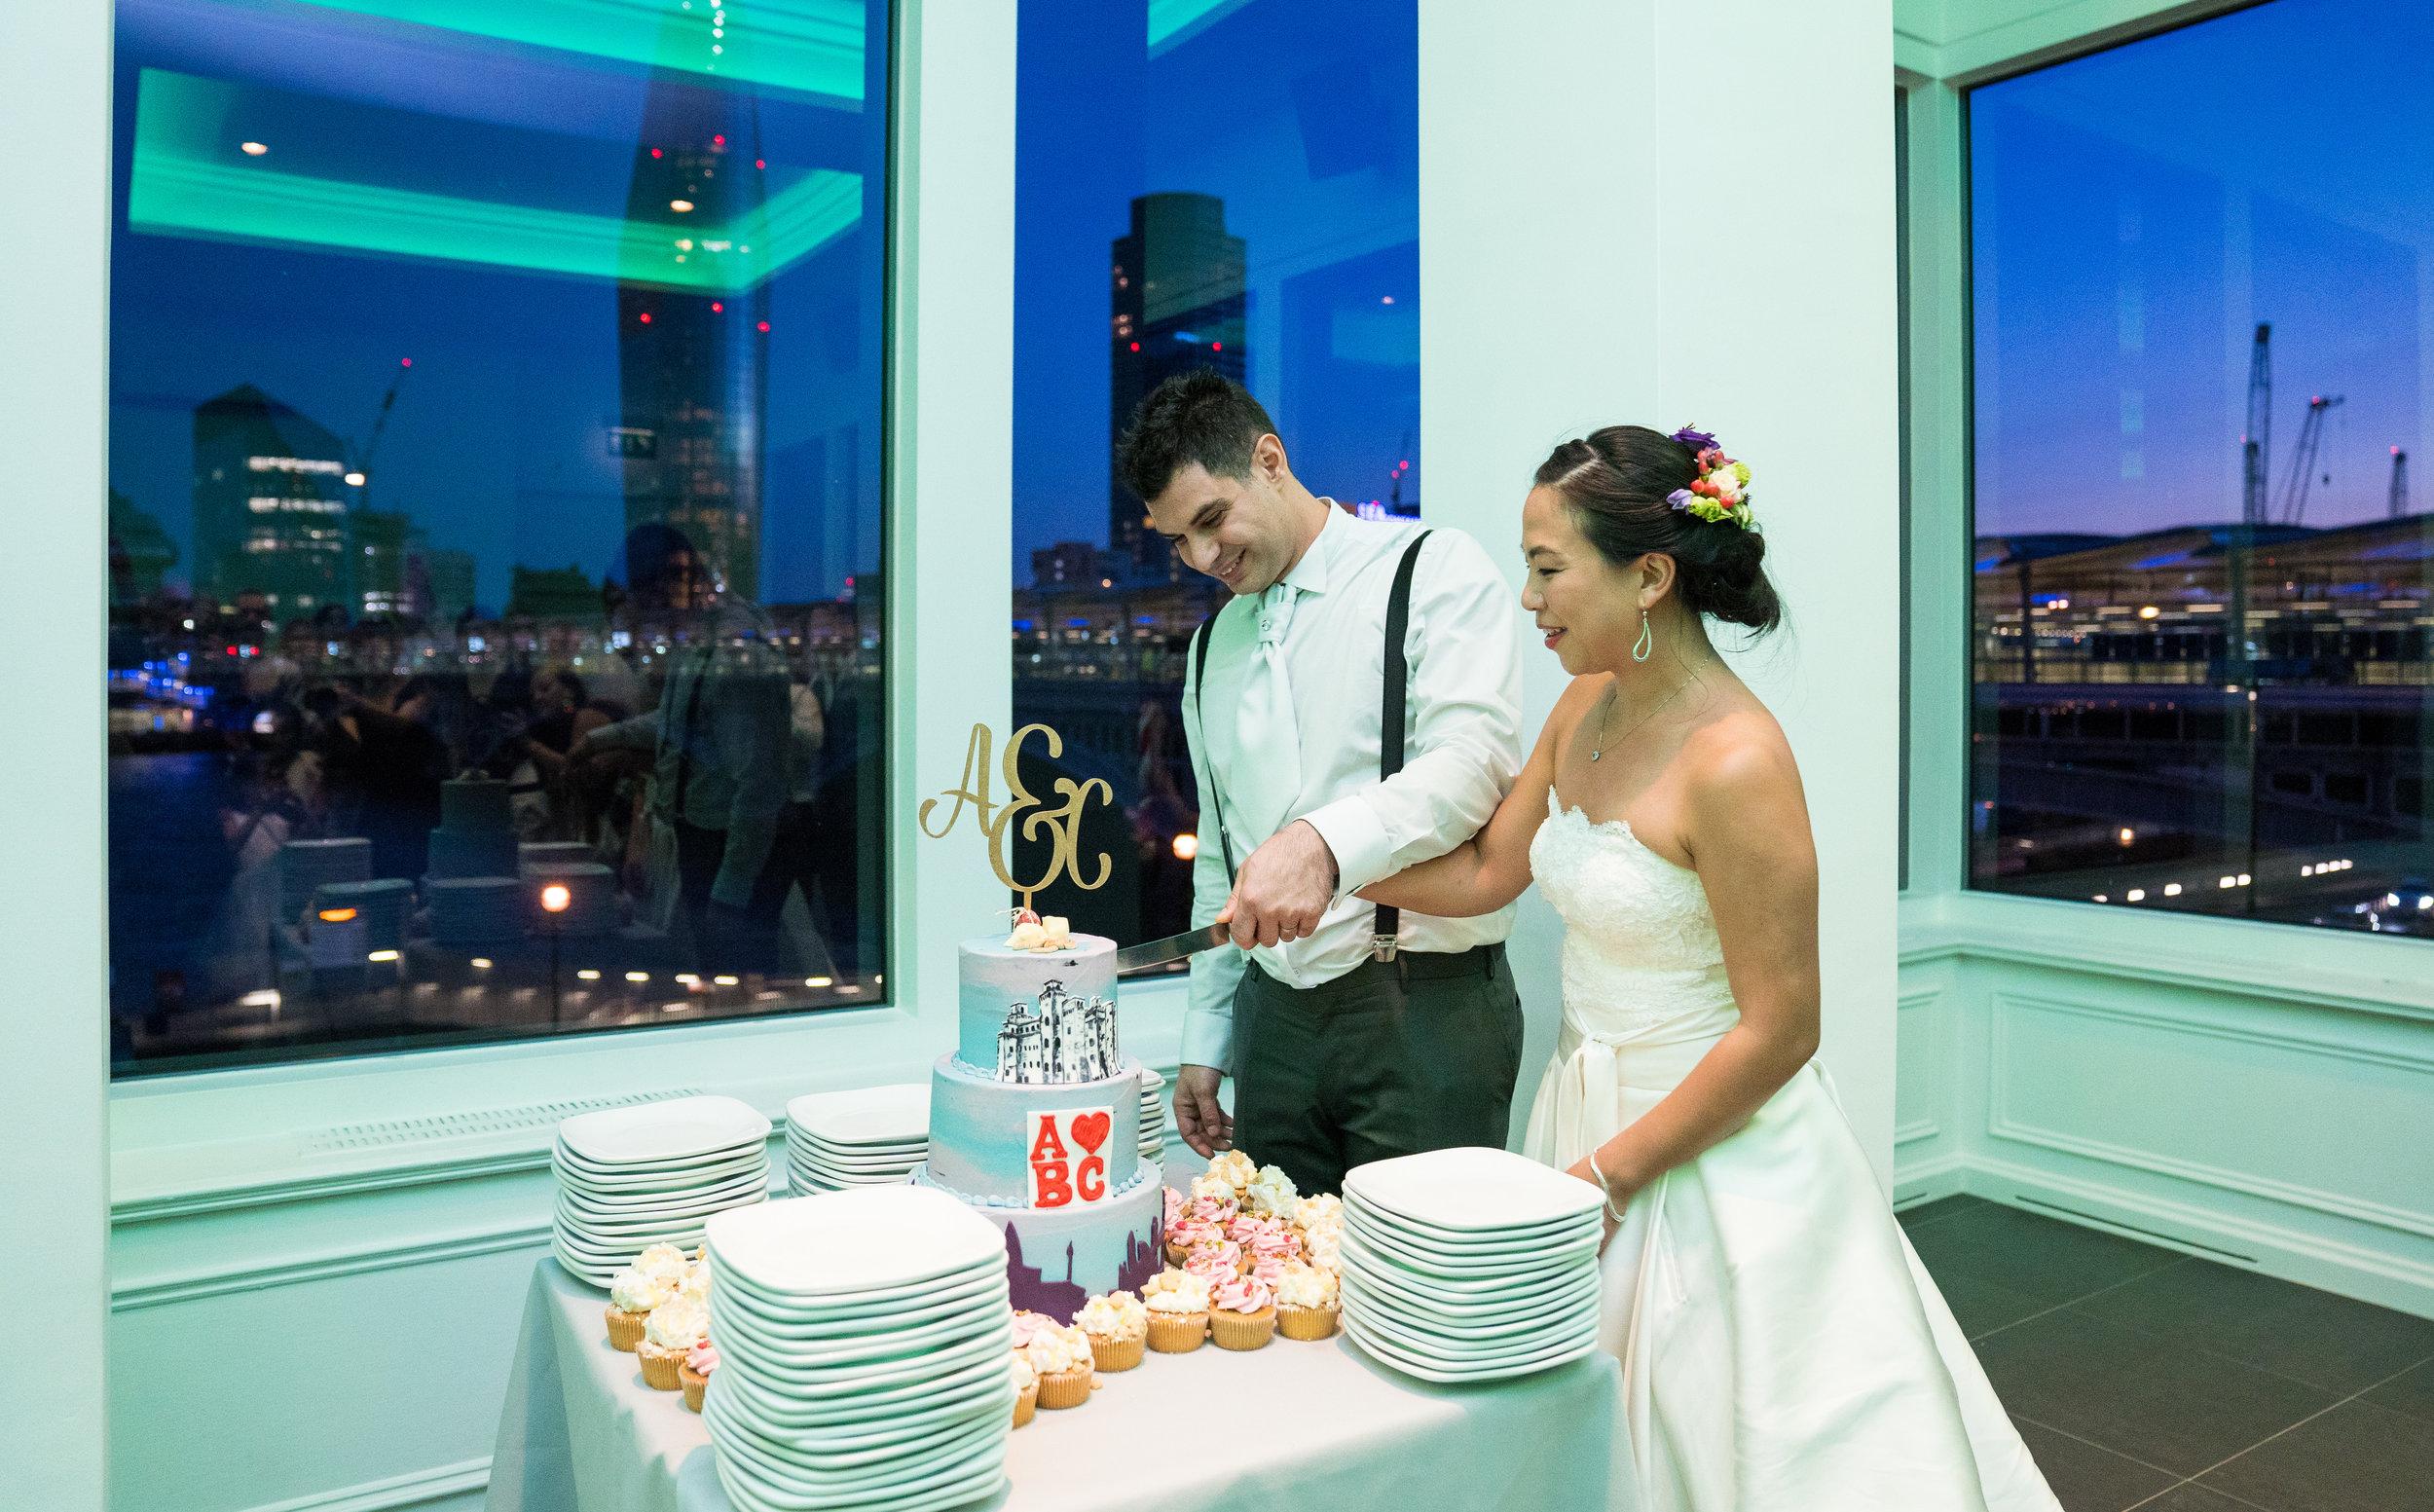 river-rooms-tower-bridge-london-stpauls-mondrian-hotel-wedding-photography-videography-80